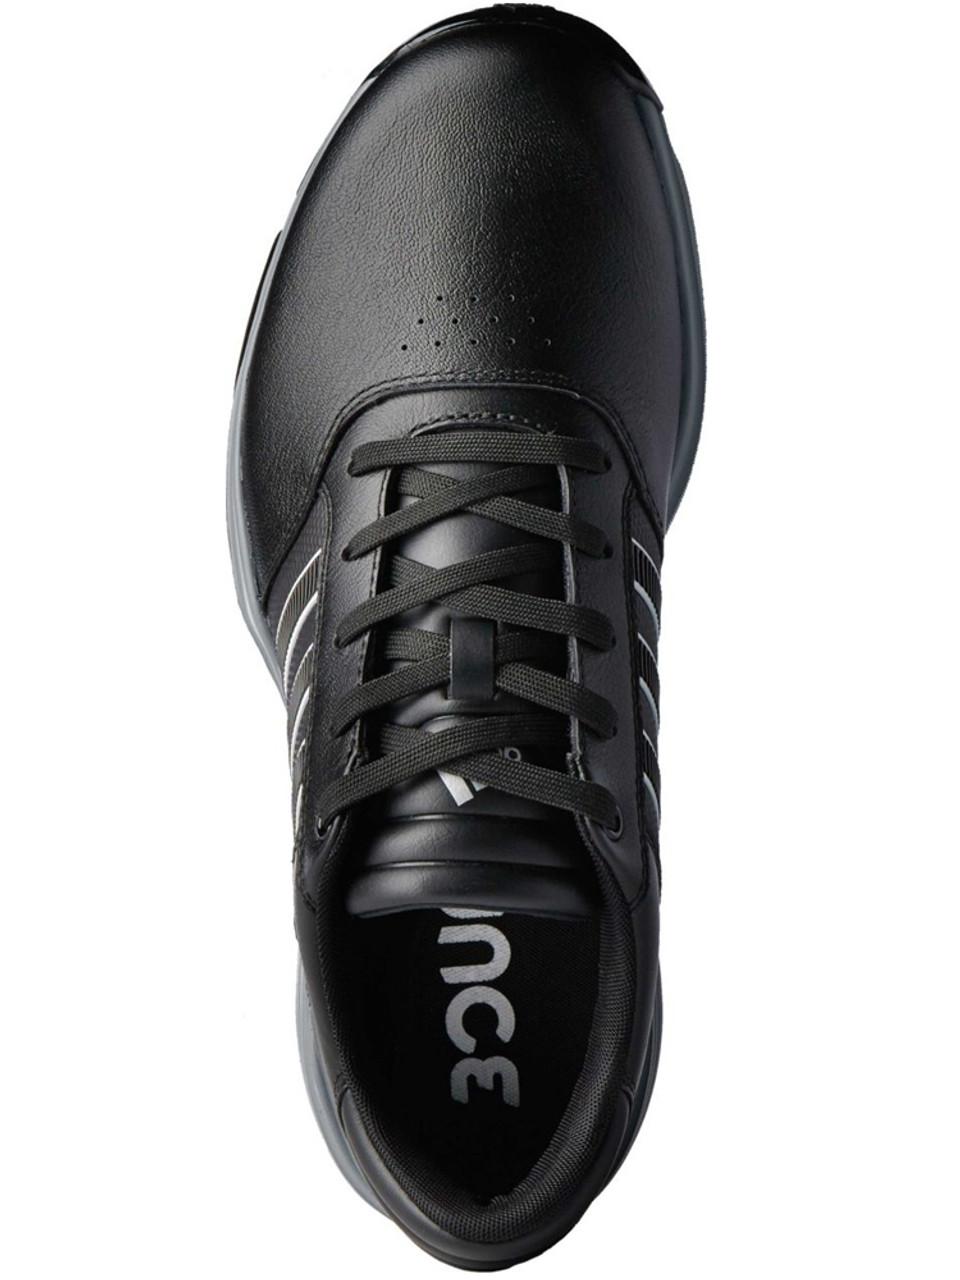 newest 35341 e03a3 Adidas 360 Bounce Golf Shoes - Black FWTR White Dark Sil Met